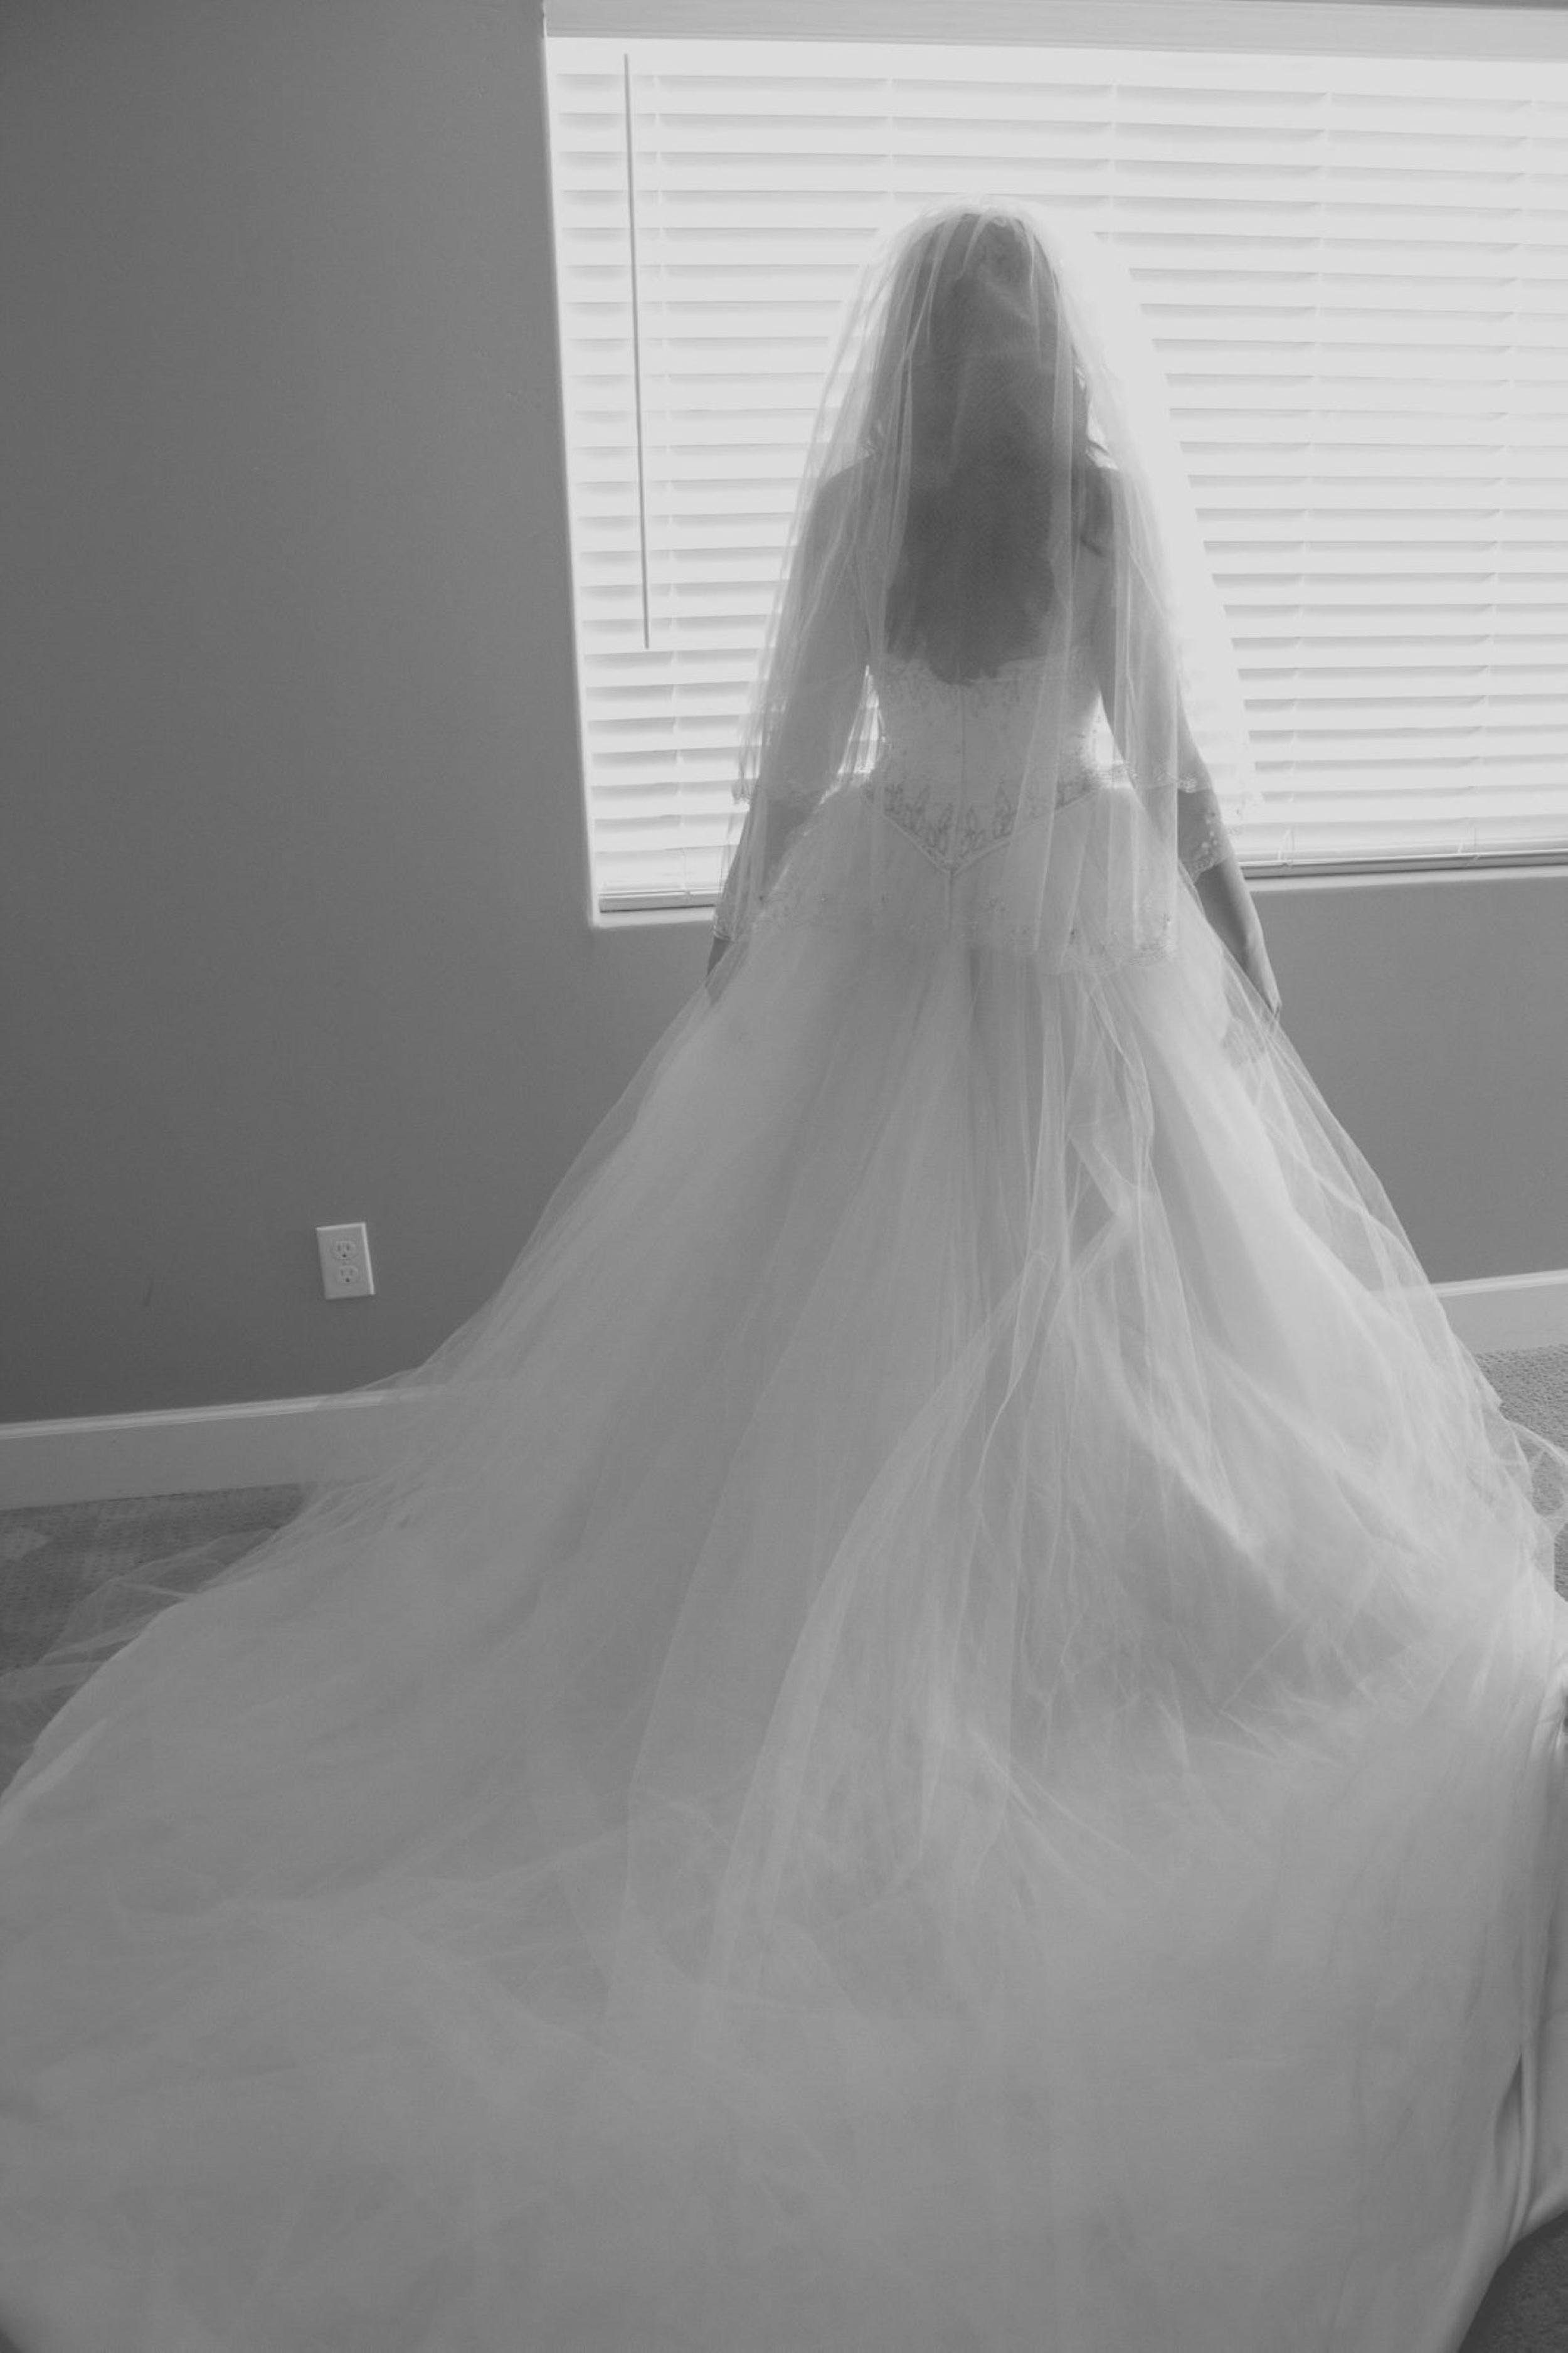 Free stock photo of #bridetobe #wedding #beautiful #memories #gown